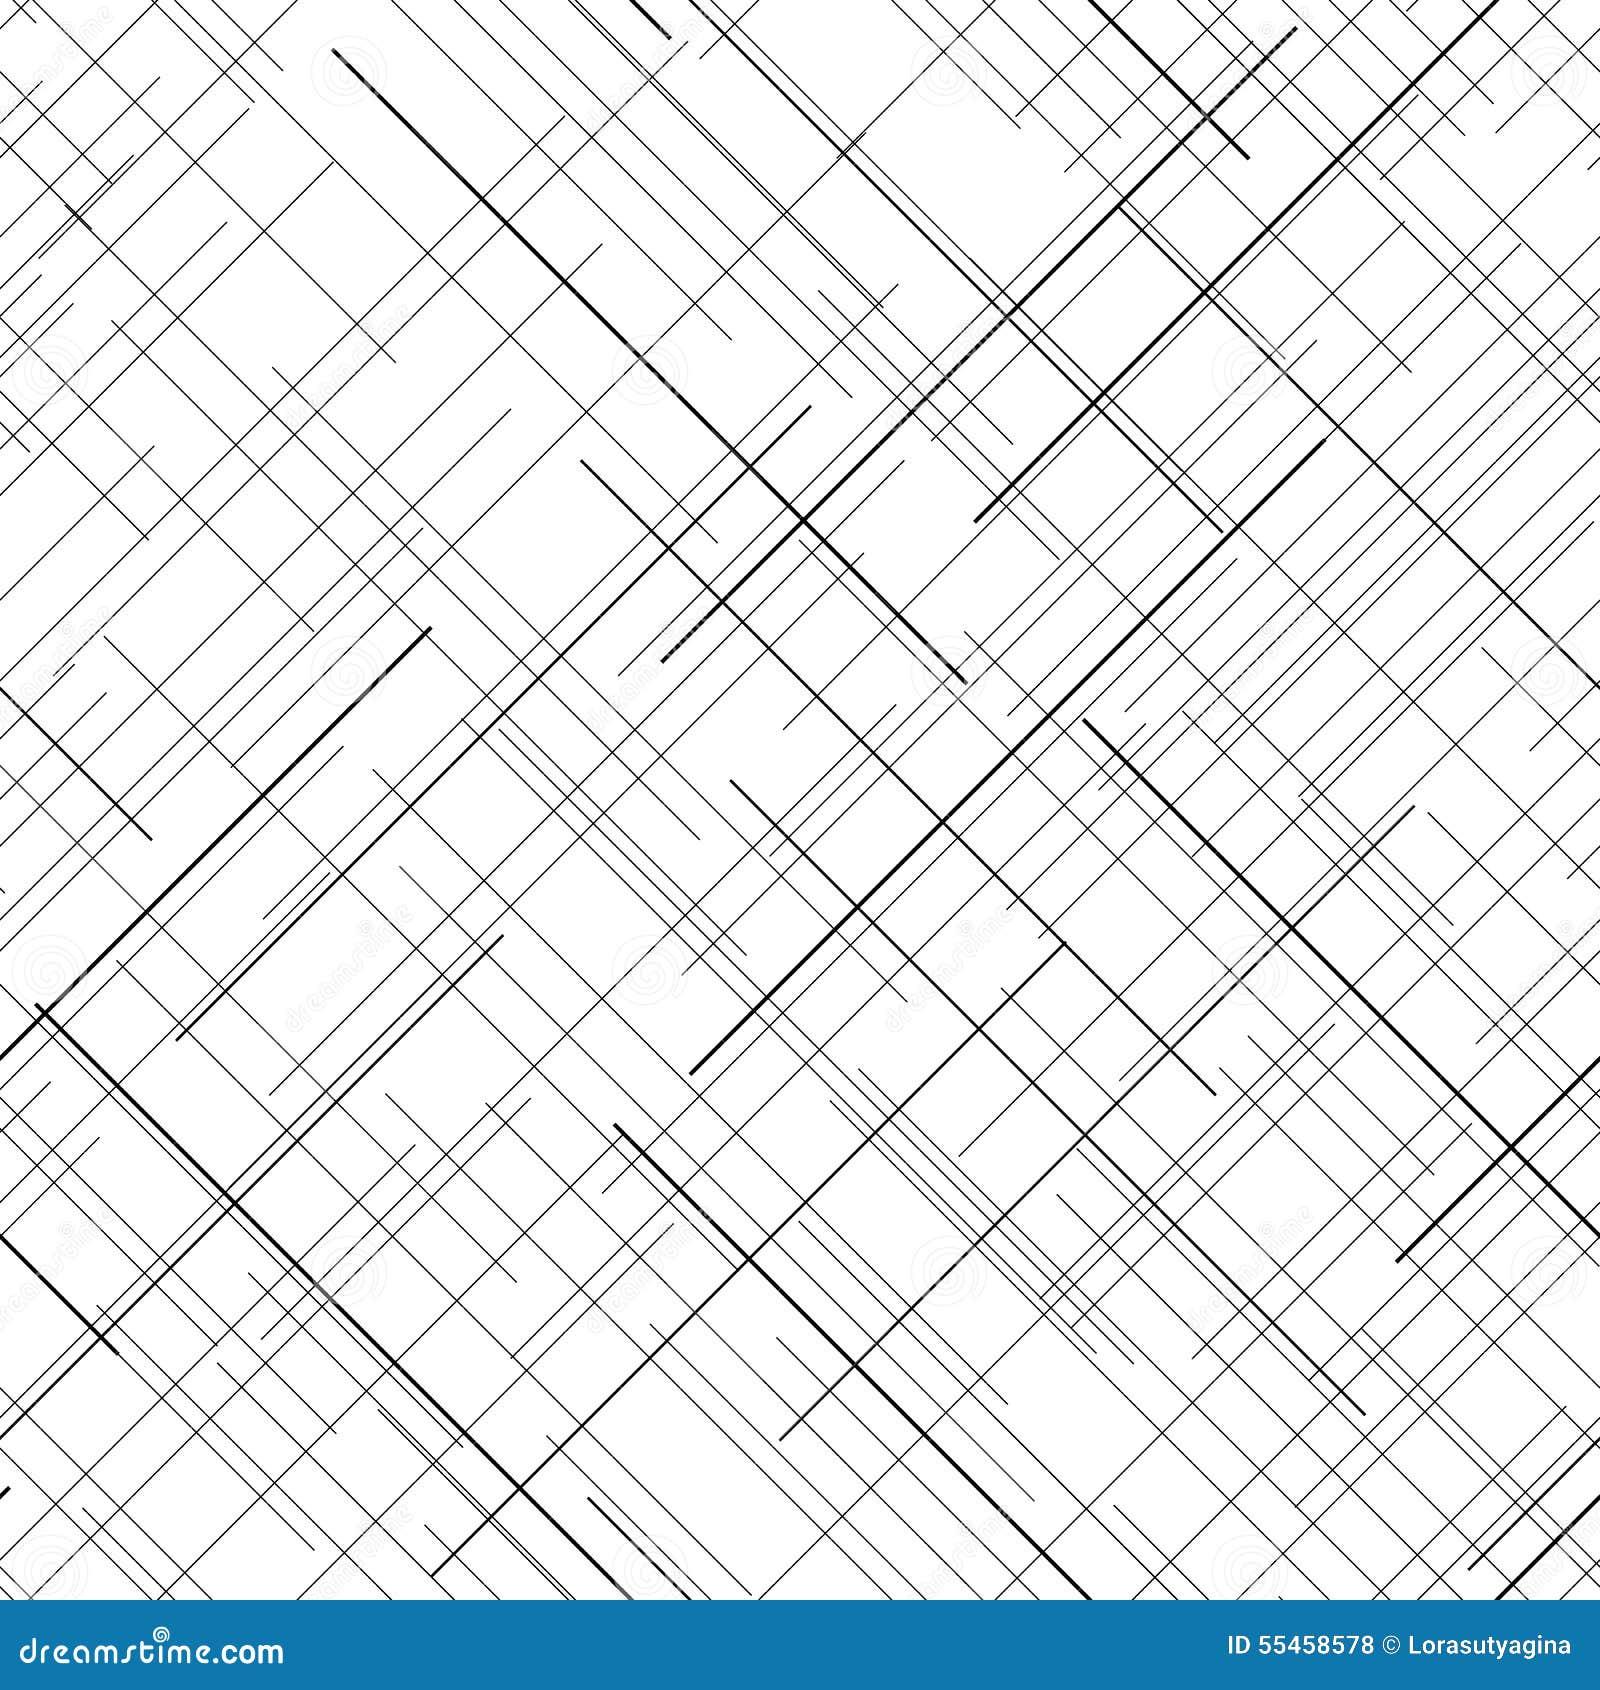 Line Texture Wallpaper : Monochrome seamless pattern diagonal random lines